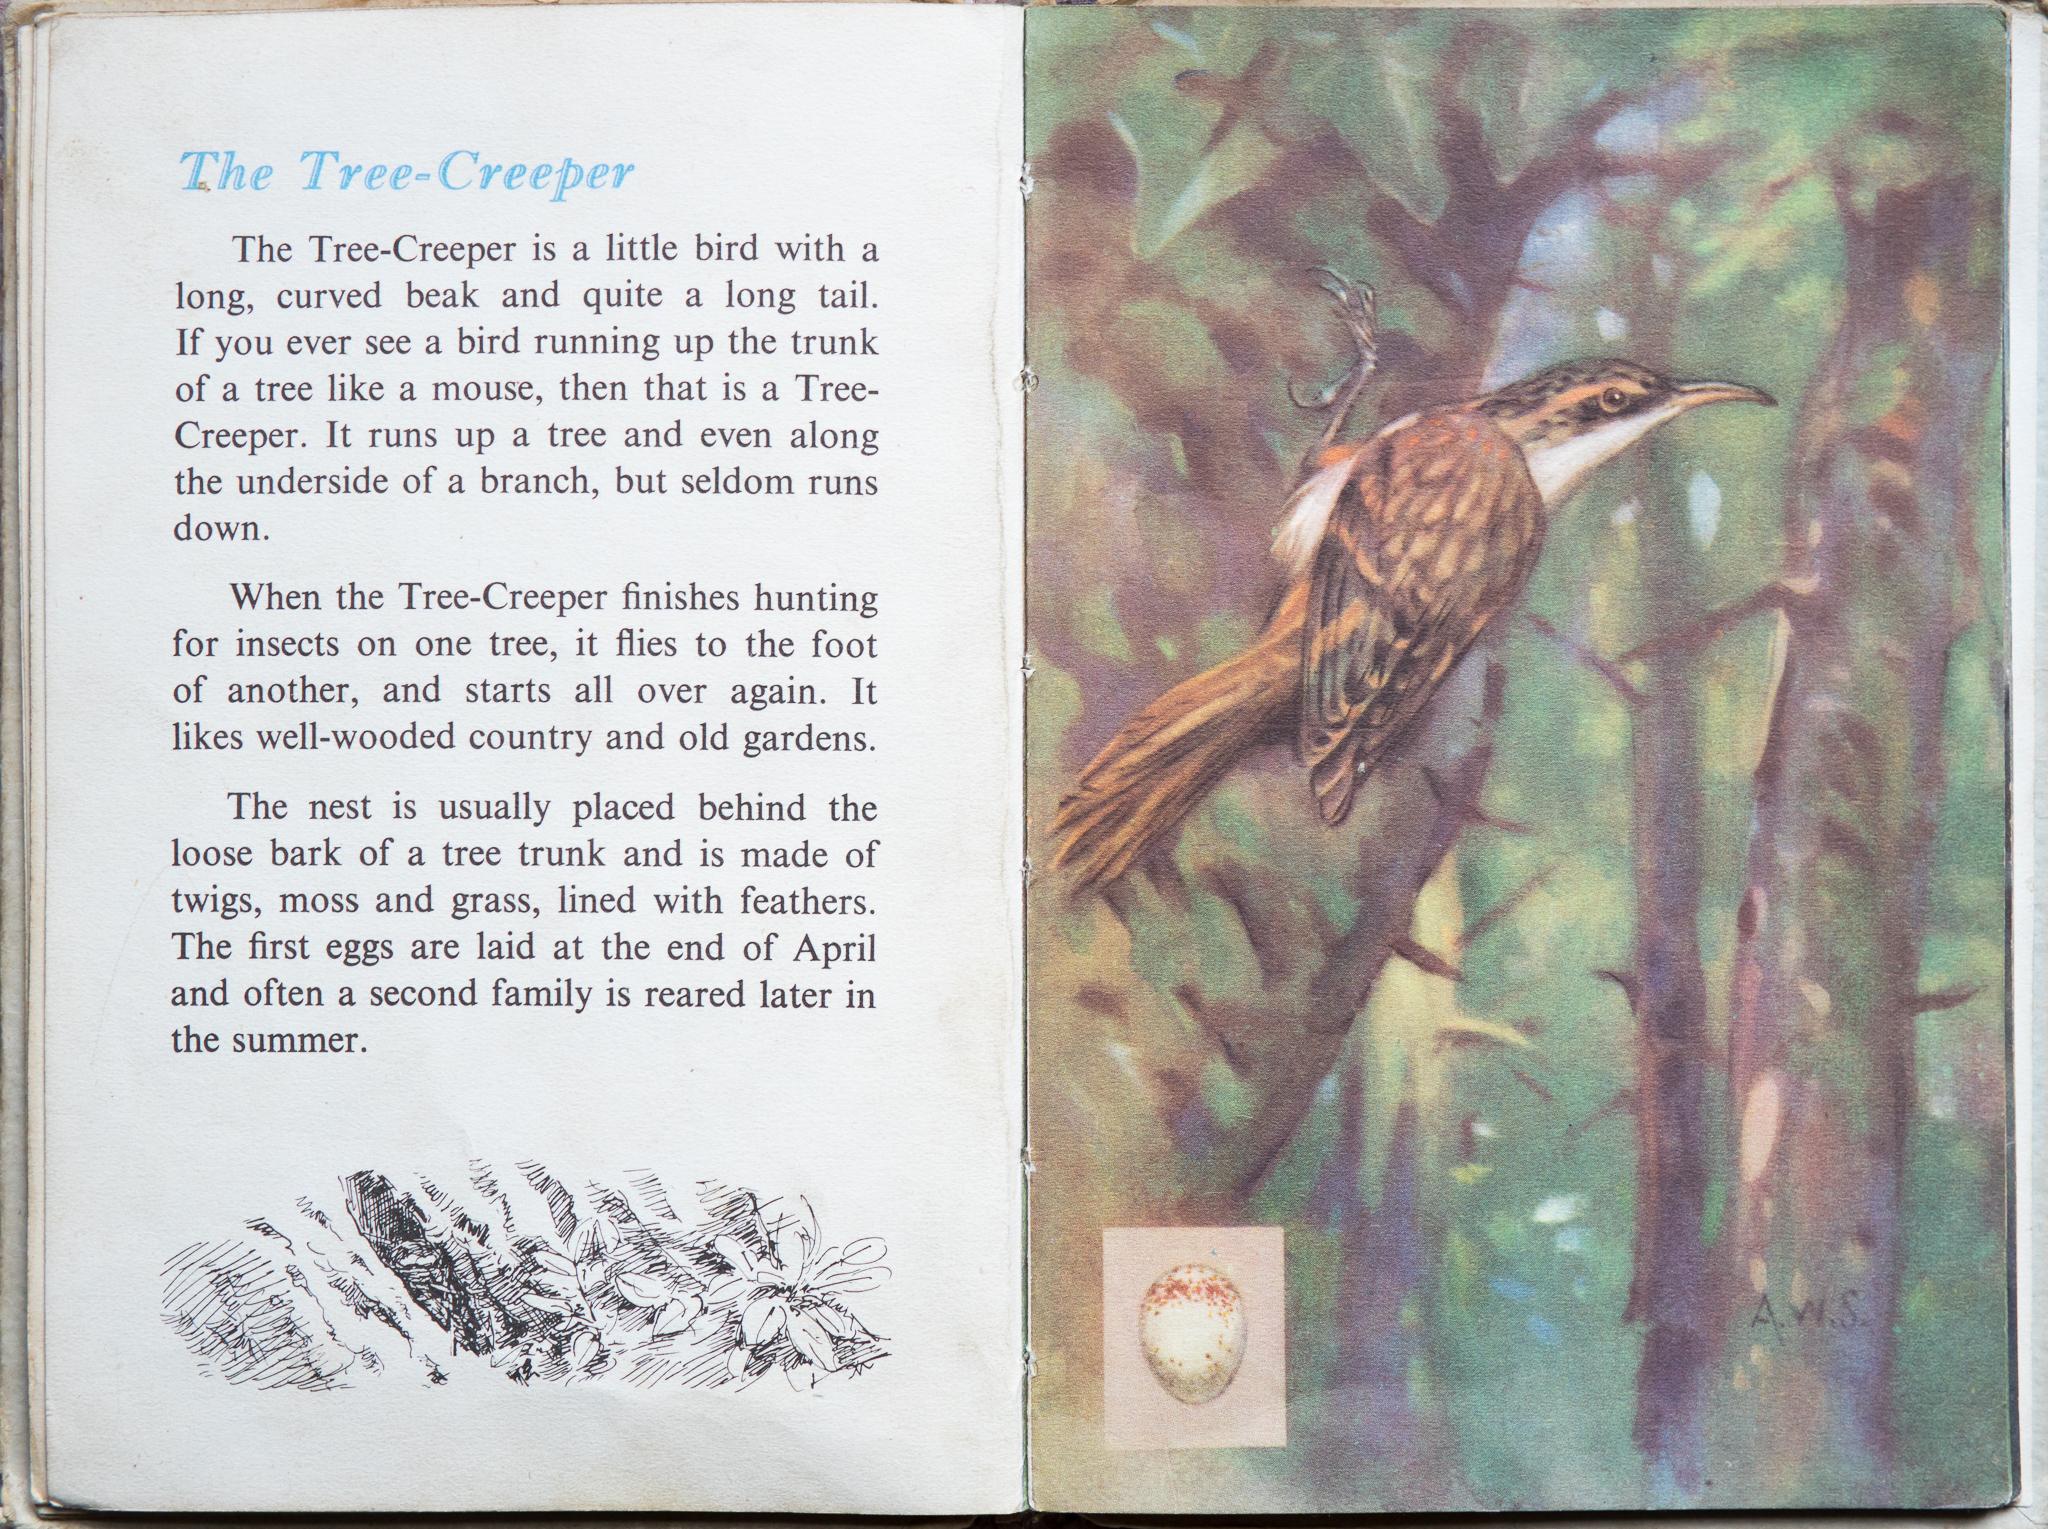 The Second Ladybird Book of British Birds - The Treecreeper